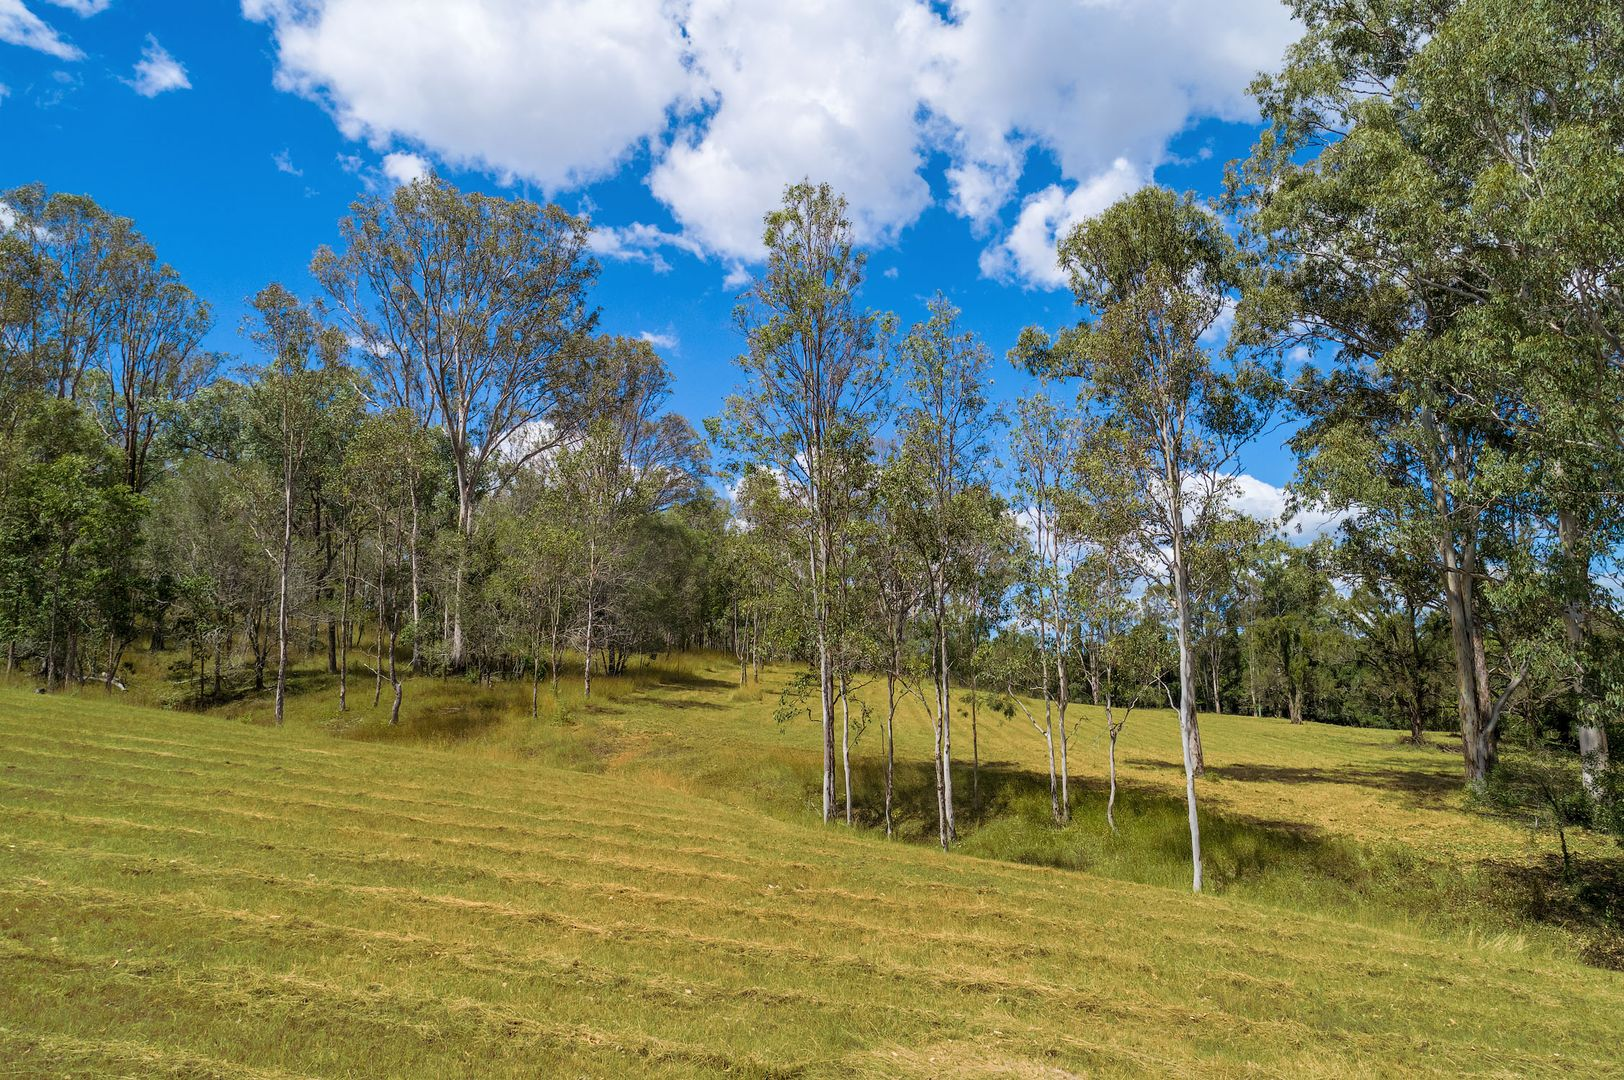 Lot 1 O'Brien Road, Widgee Crossing South QLD 4570, Image 1